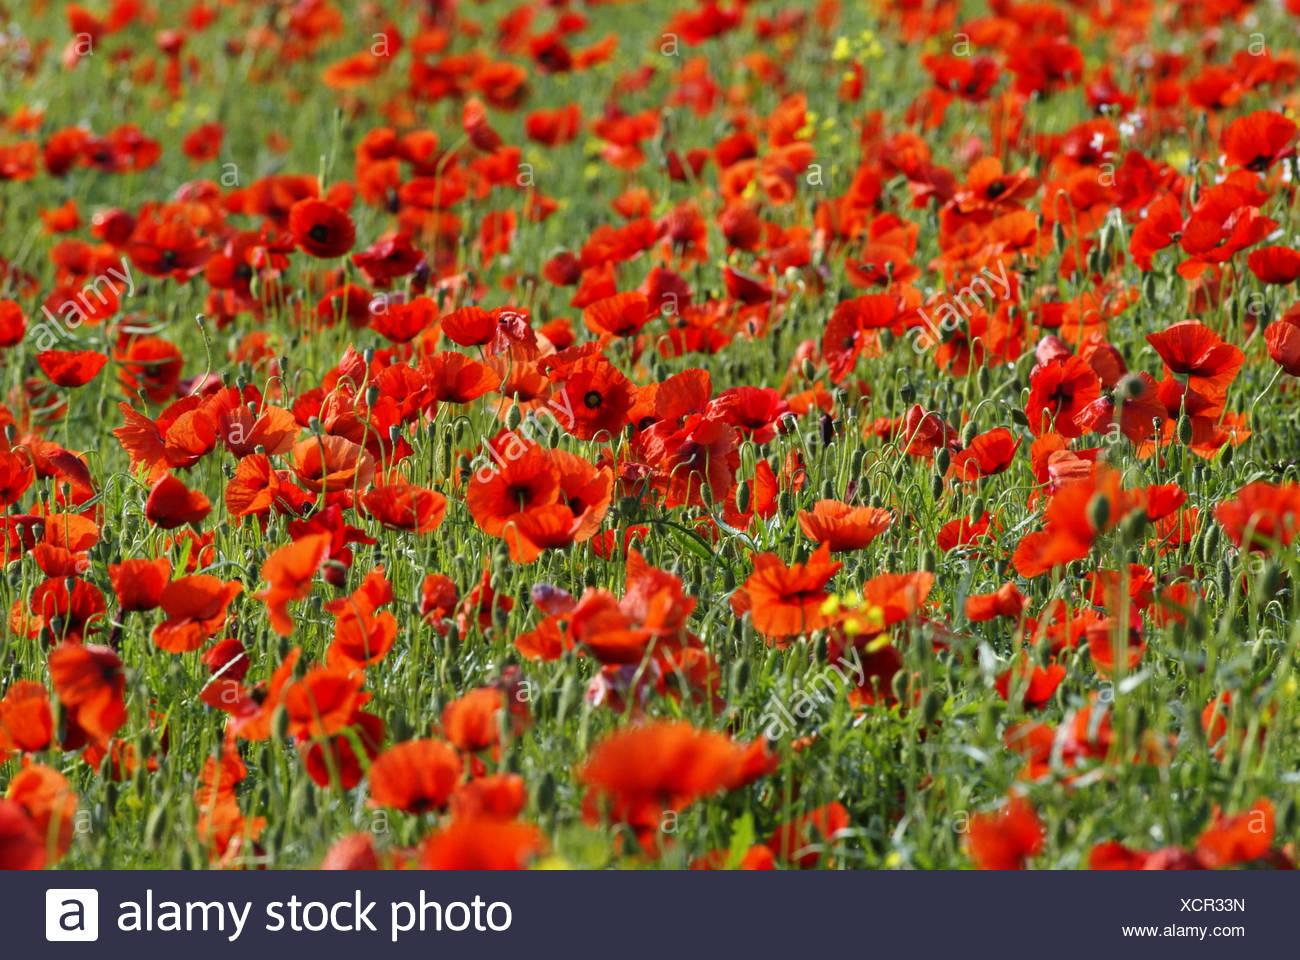 Meadow clap poppy seed papaver rhoeas blossom flower meadow meadow clap poppy seed papaver rhoeas blossom flower meadow clap poppy seed meadow poppy meadow flowers poppies plants poppy seed plants poppy mightylinksfo